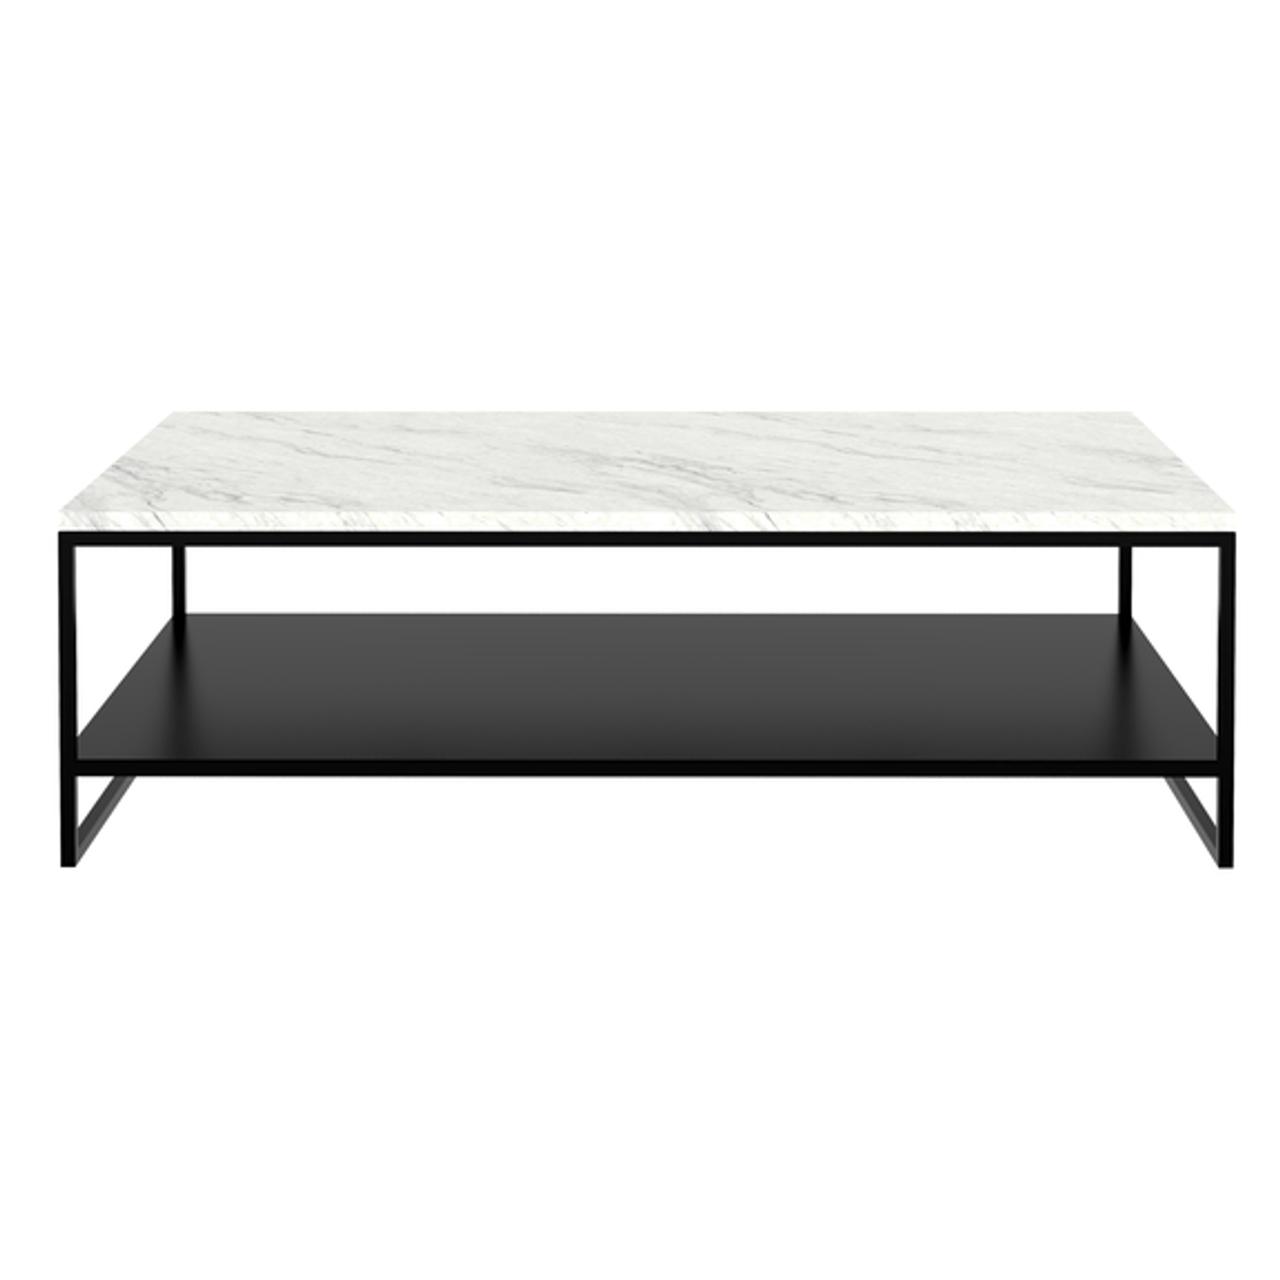 marble stone black metal coffee table